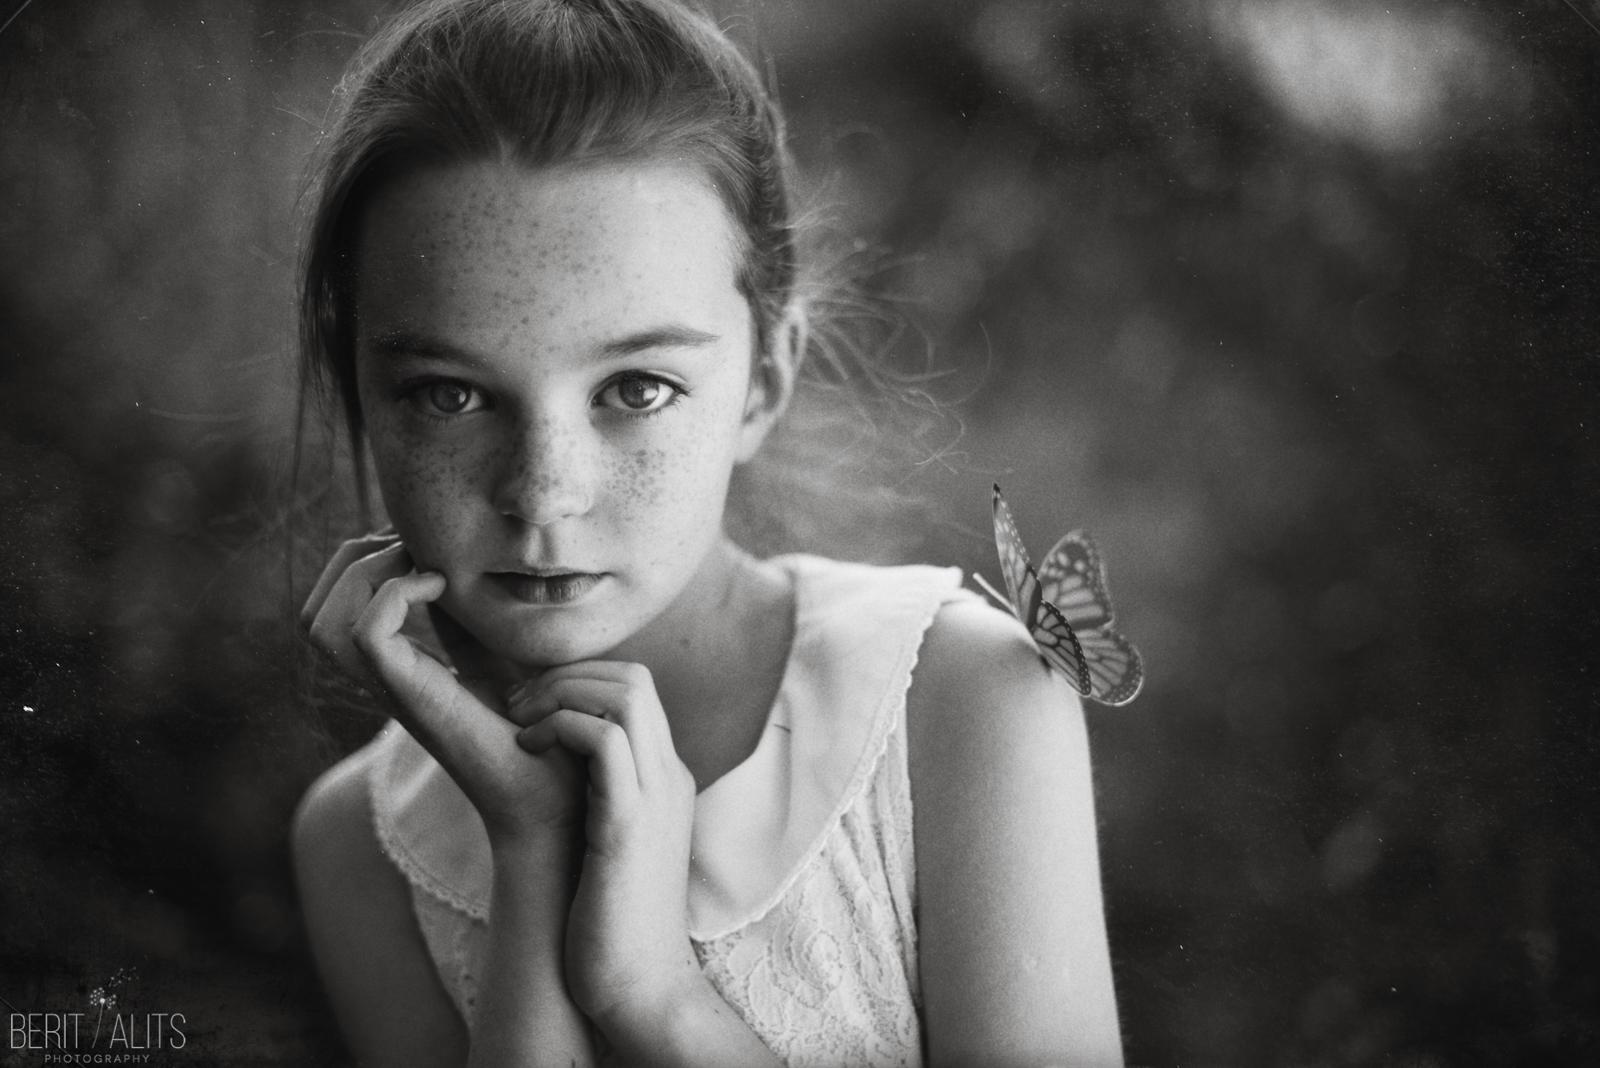 Berit Alits Photography